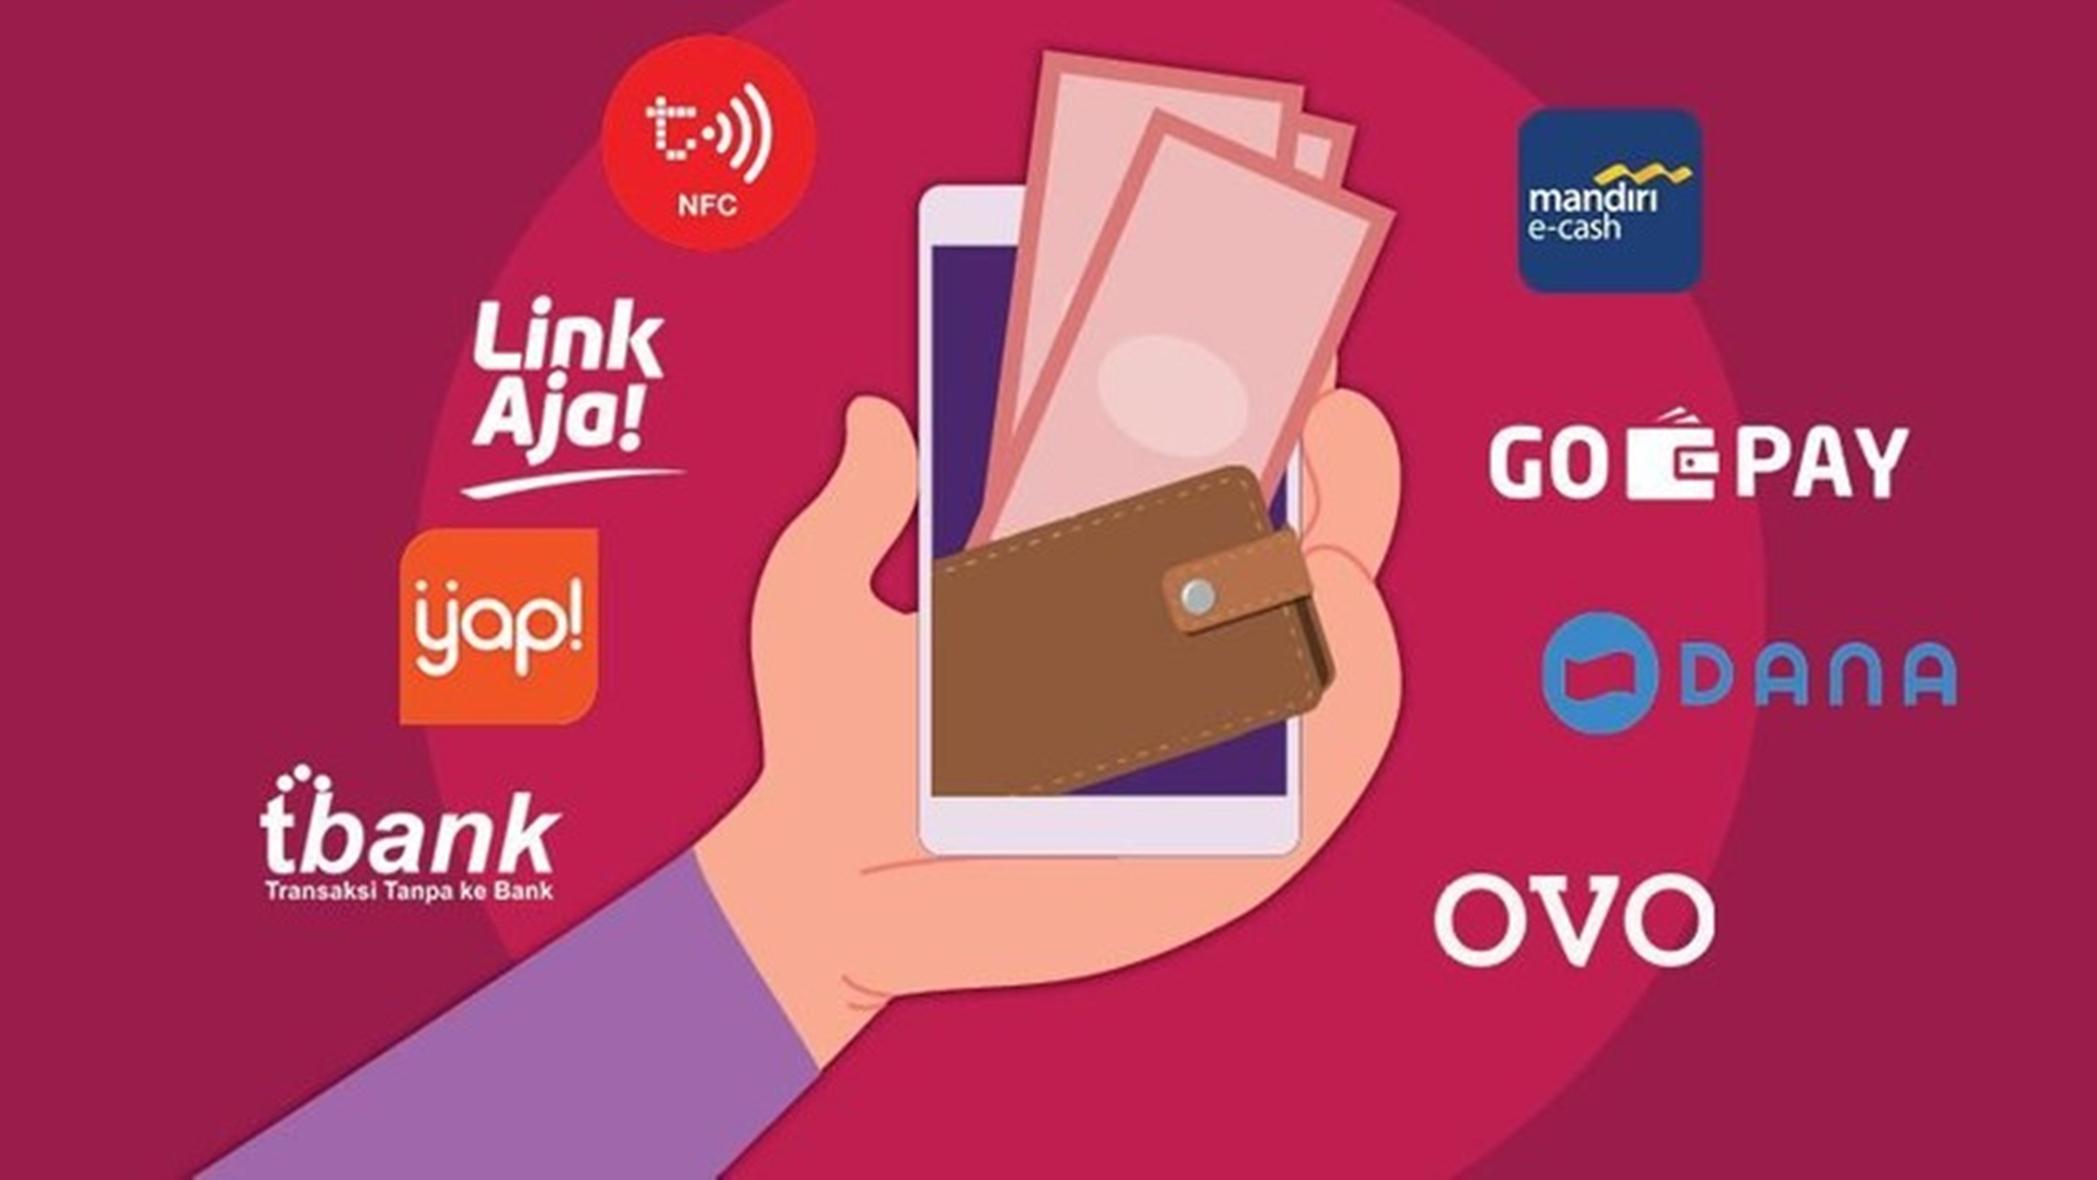 Semakin Mudah Bertransaksi, Aplikasi Dompet Digital Melonjak Naik Sampai 50 Persen 3